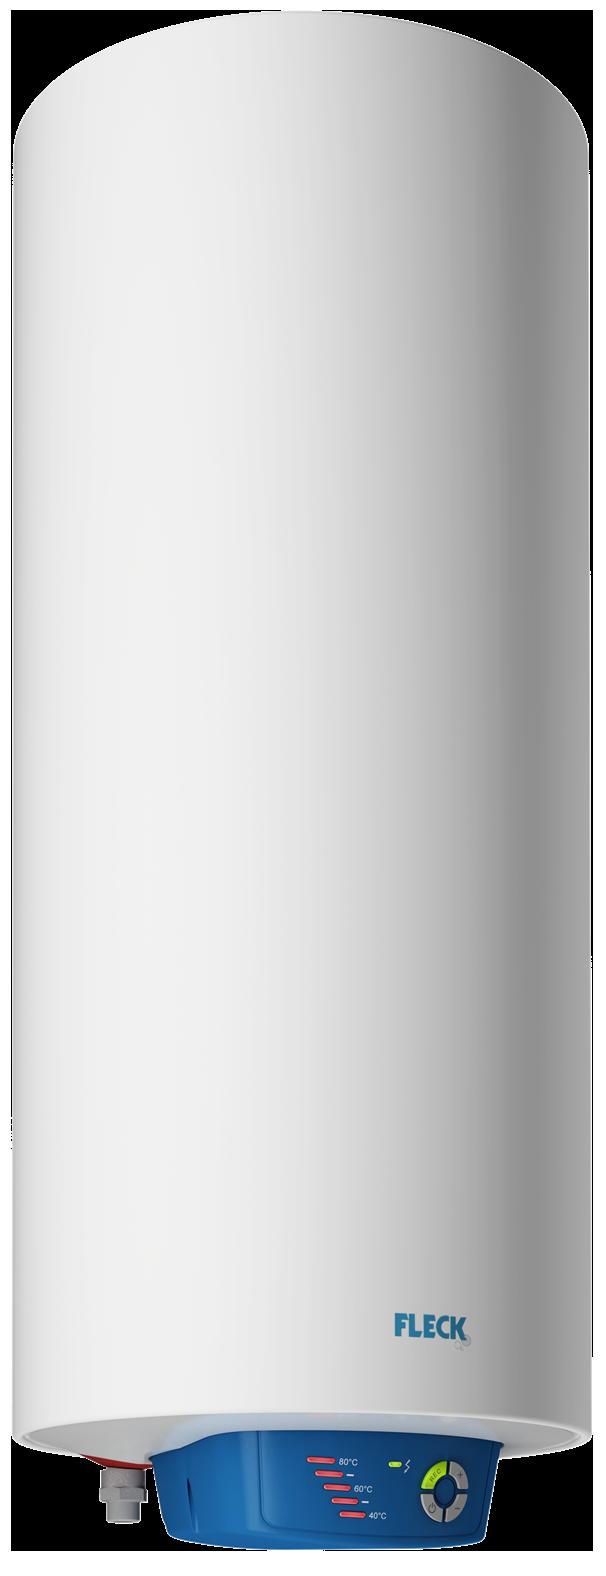 Termos el ctricos peque os 15 a 30 litros modelo bon de - Termo electrico 15 litros precio ...